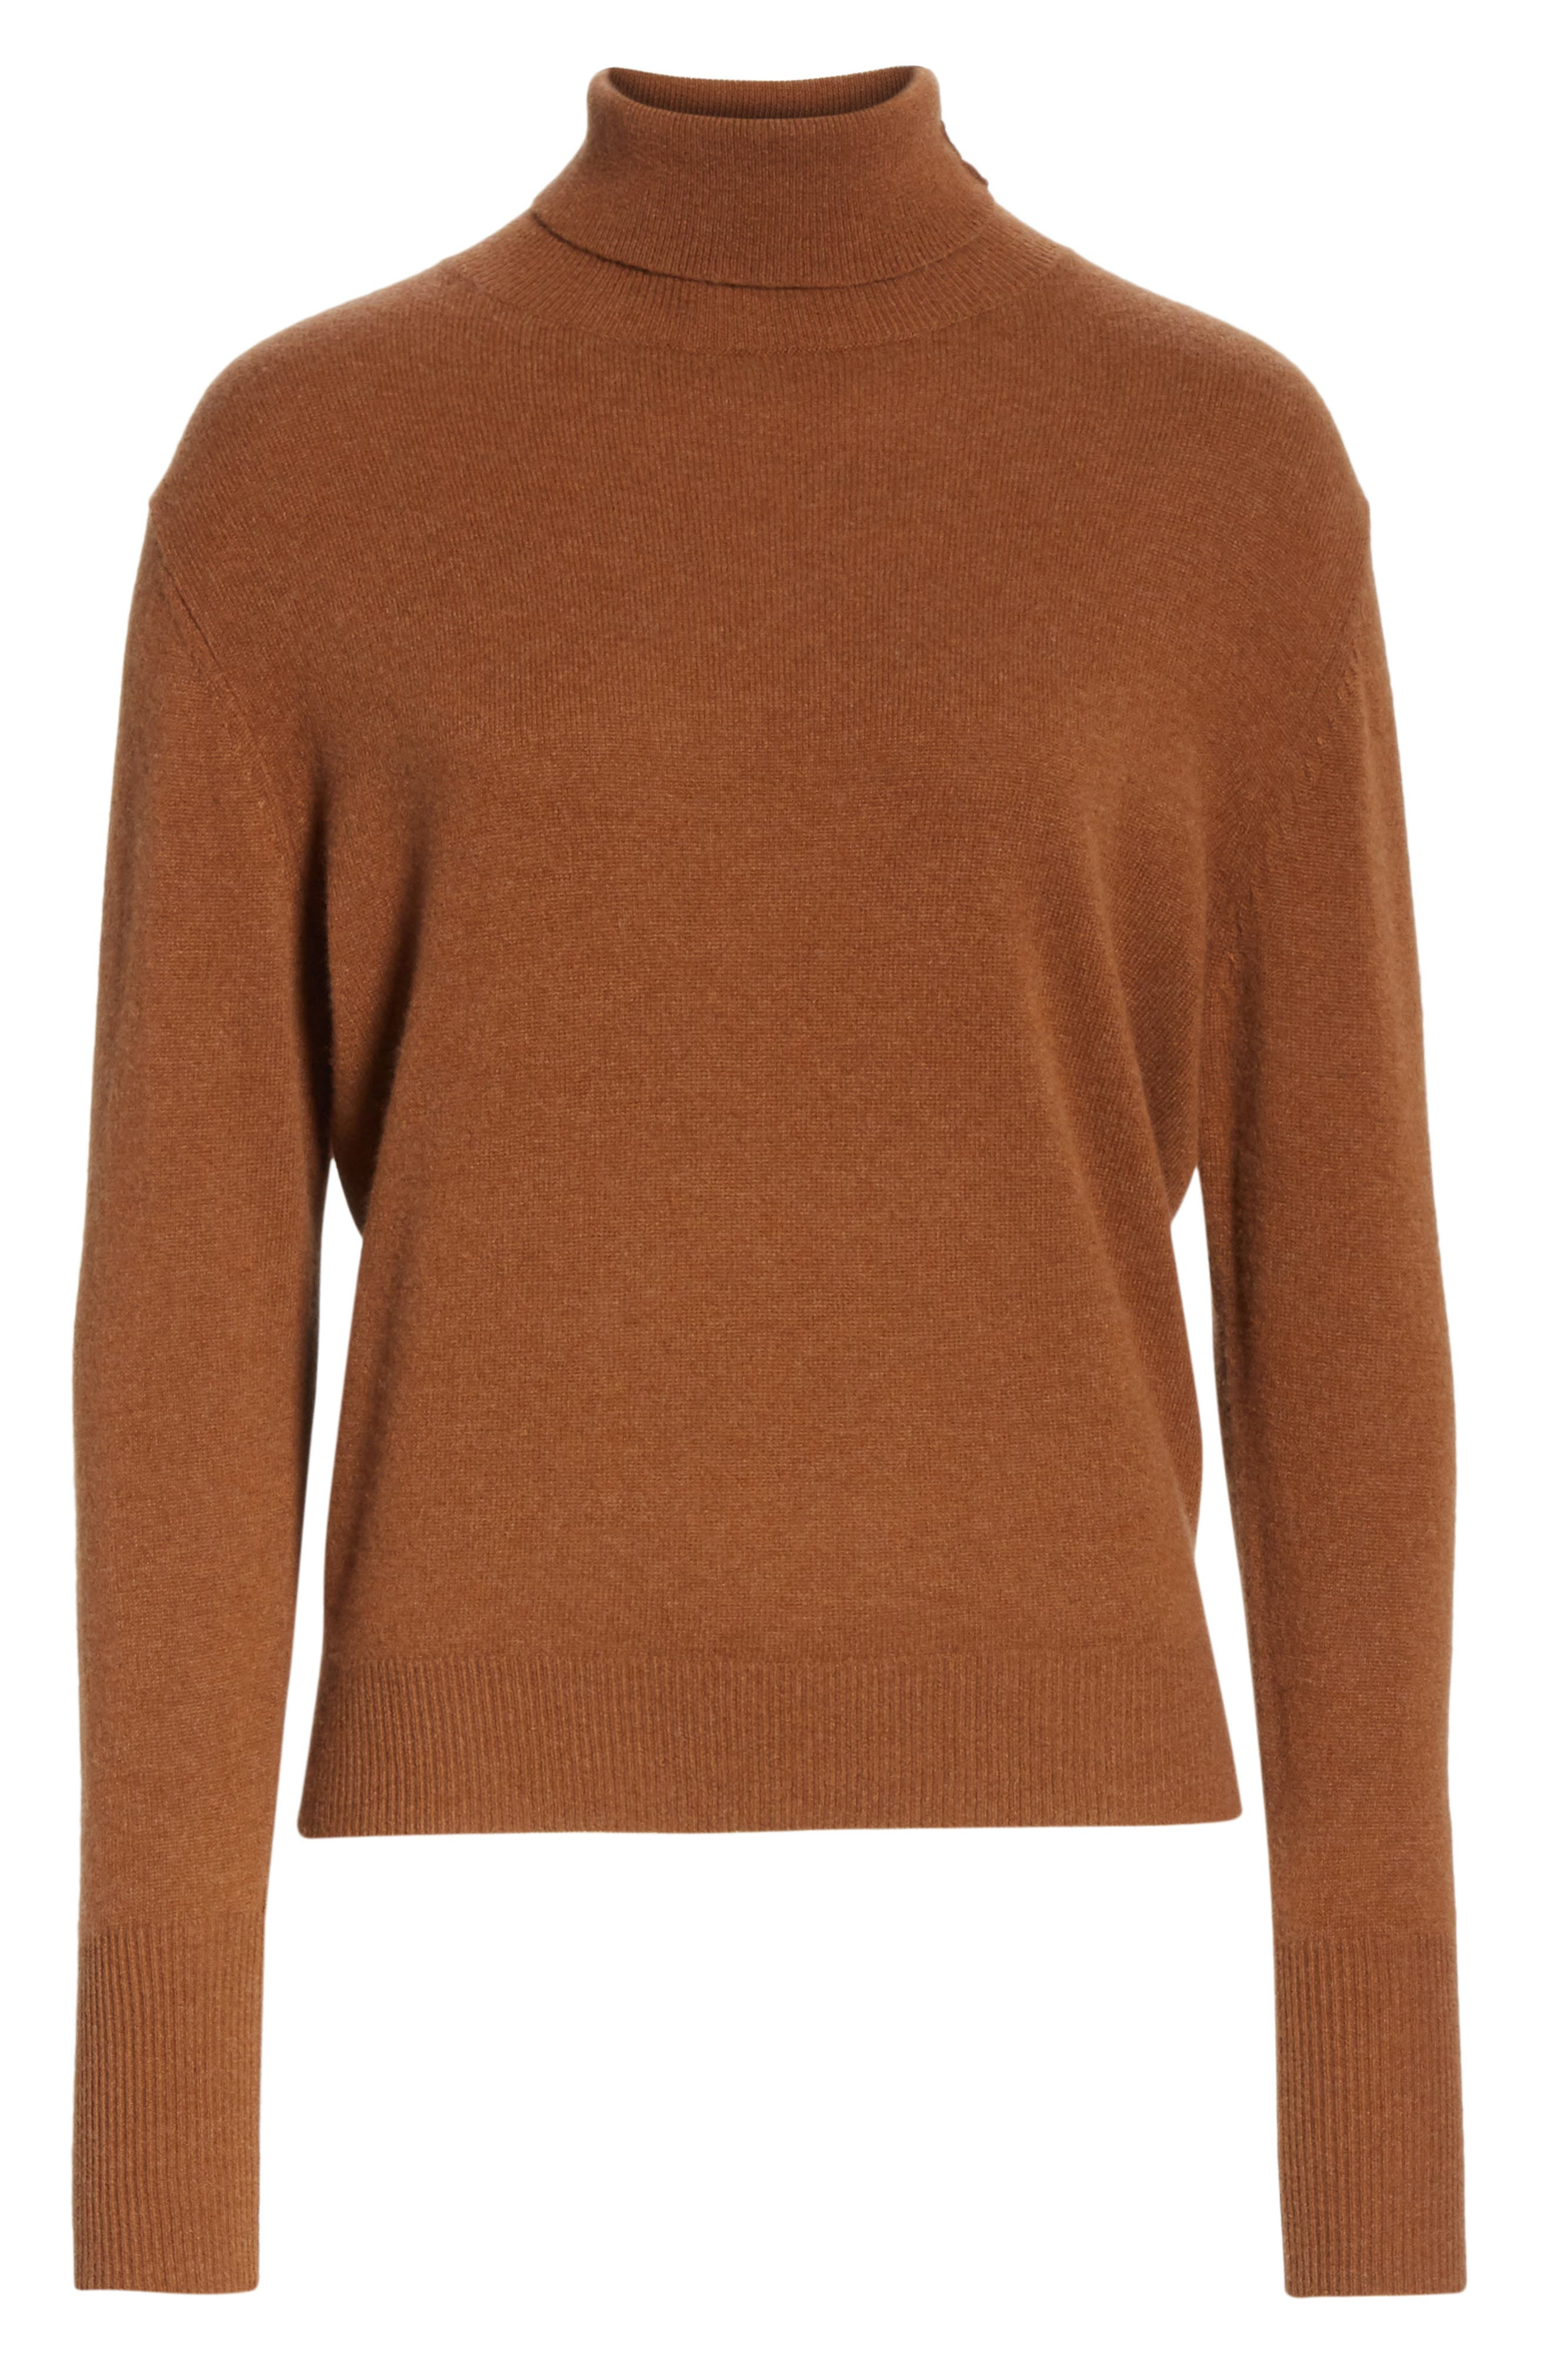 NILI LOTAN, Ralphie Cashmere Turtleneck Sweater, Alternate thumbnail 6, color, COGNAC